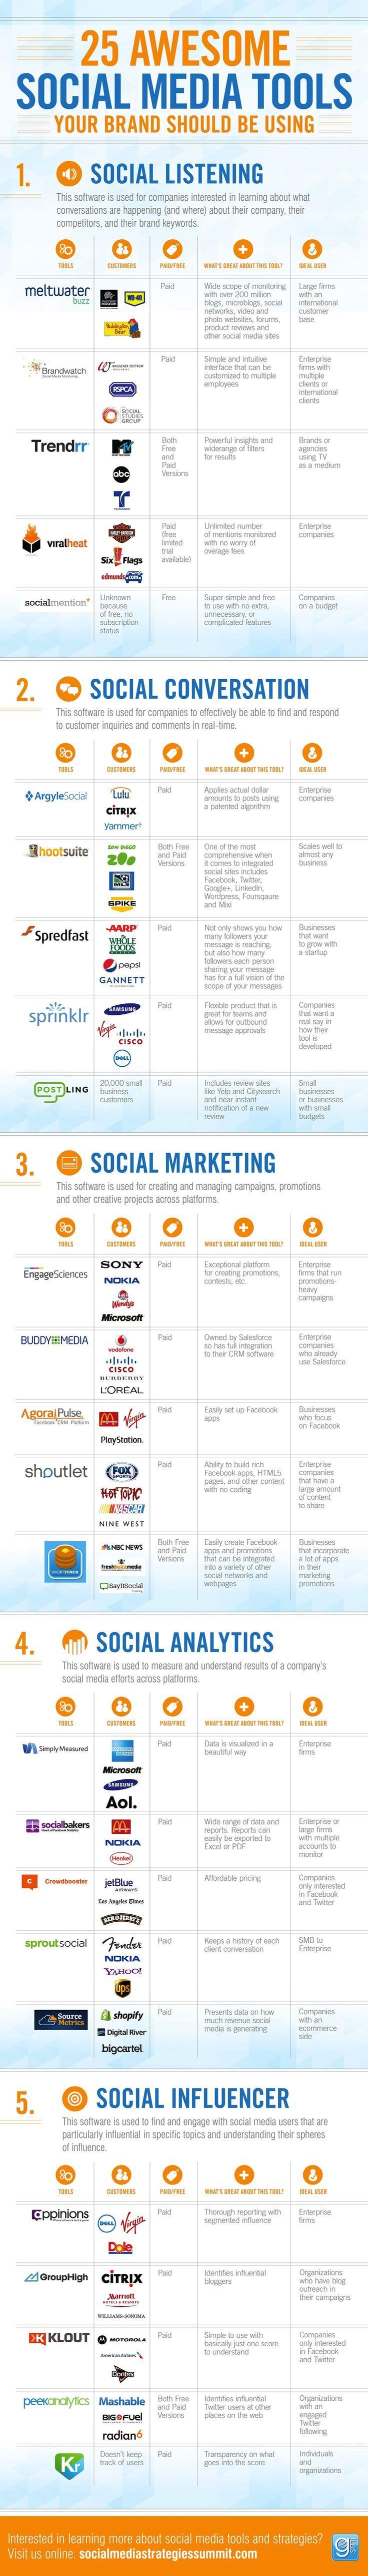 25 Awesome Social Media Tools